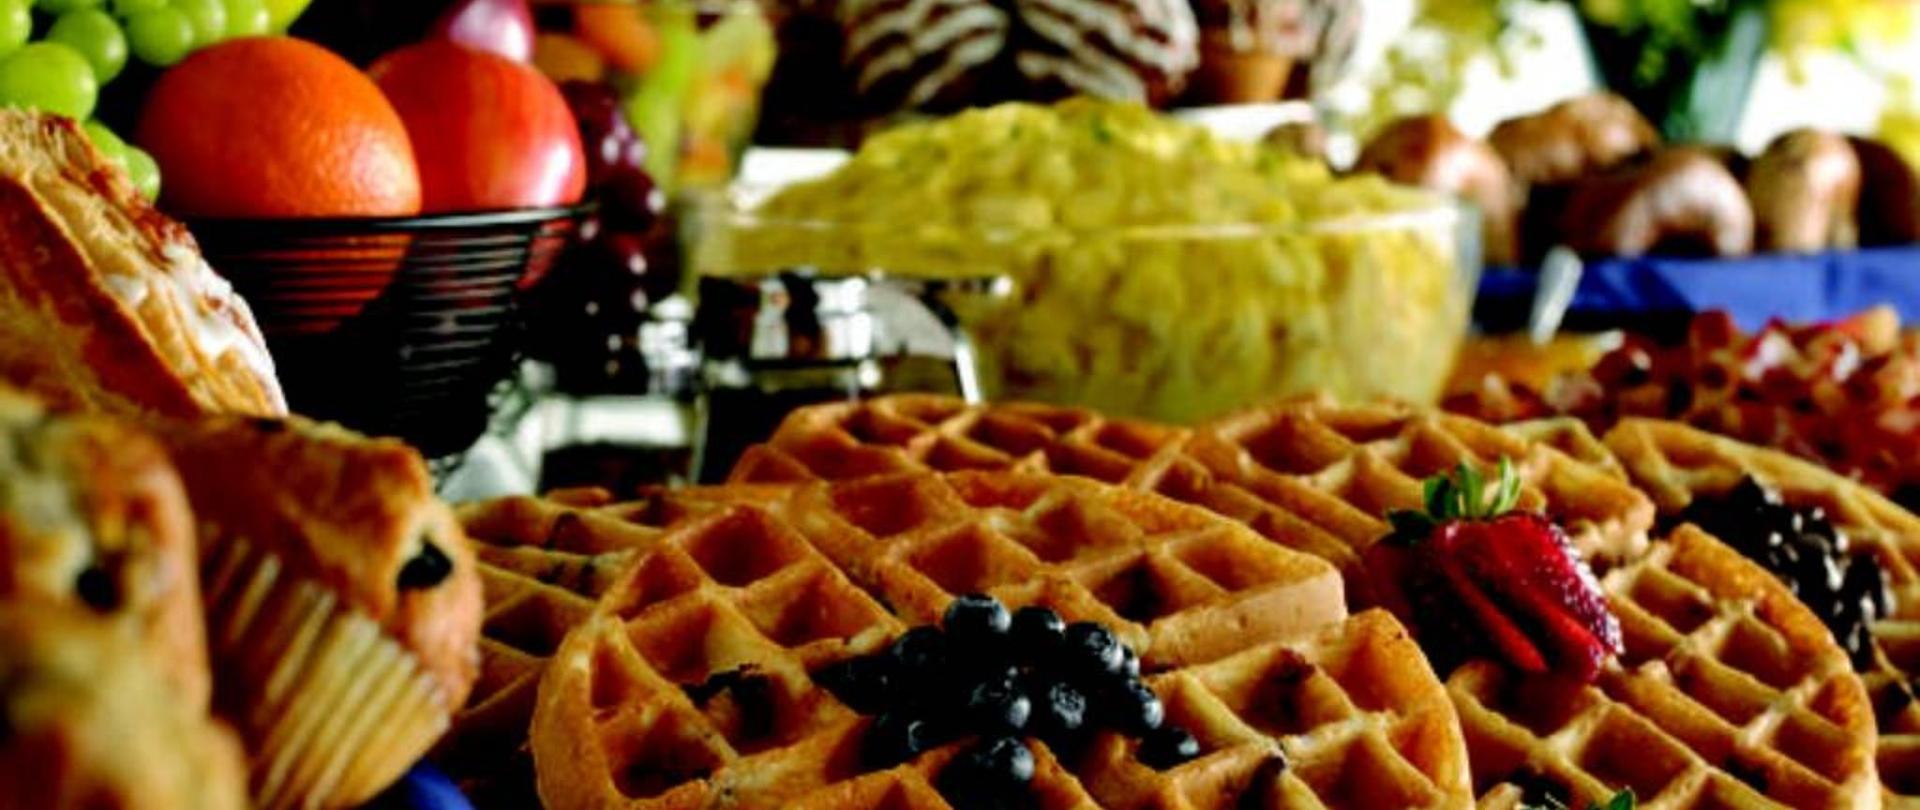 04-libre-petit-déjeuner-pour-un-merveilleux-wake-up.jpg.1024x0.jpg